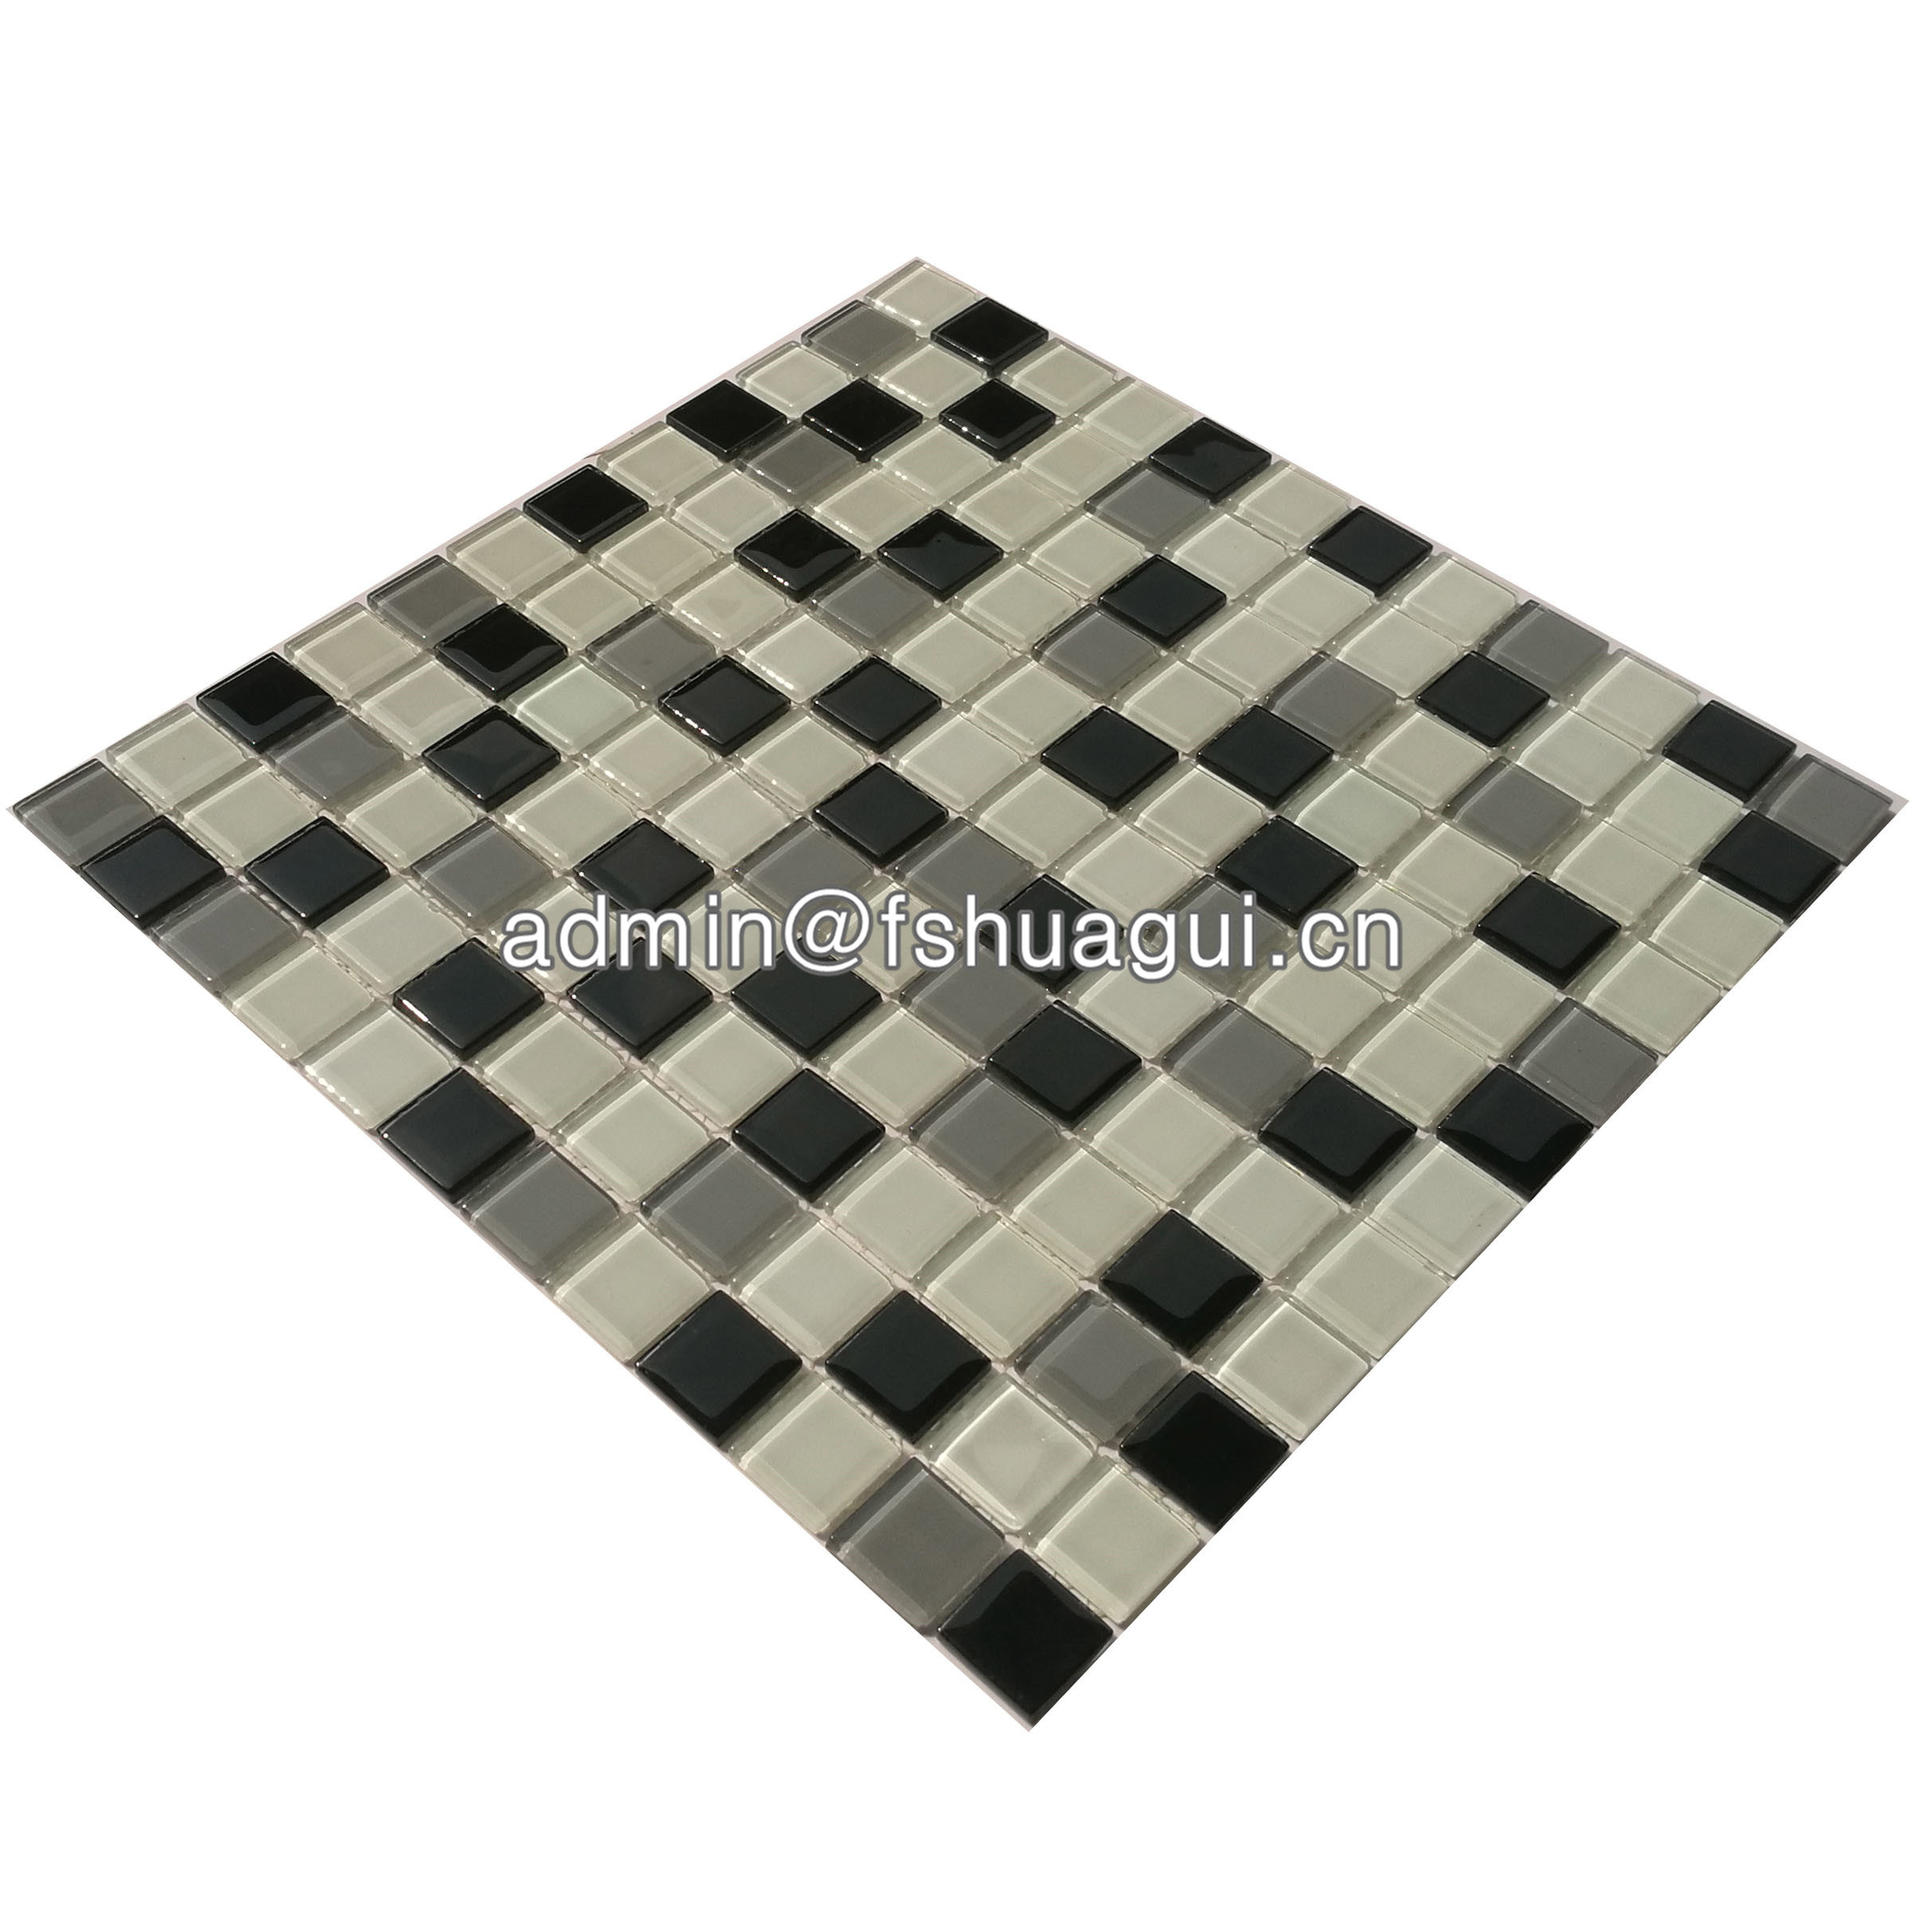 Black and white glass mosaic tile design for backsplash walls HG-15-6